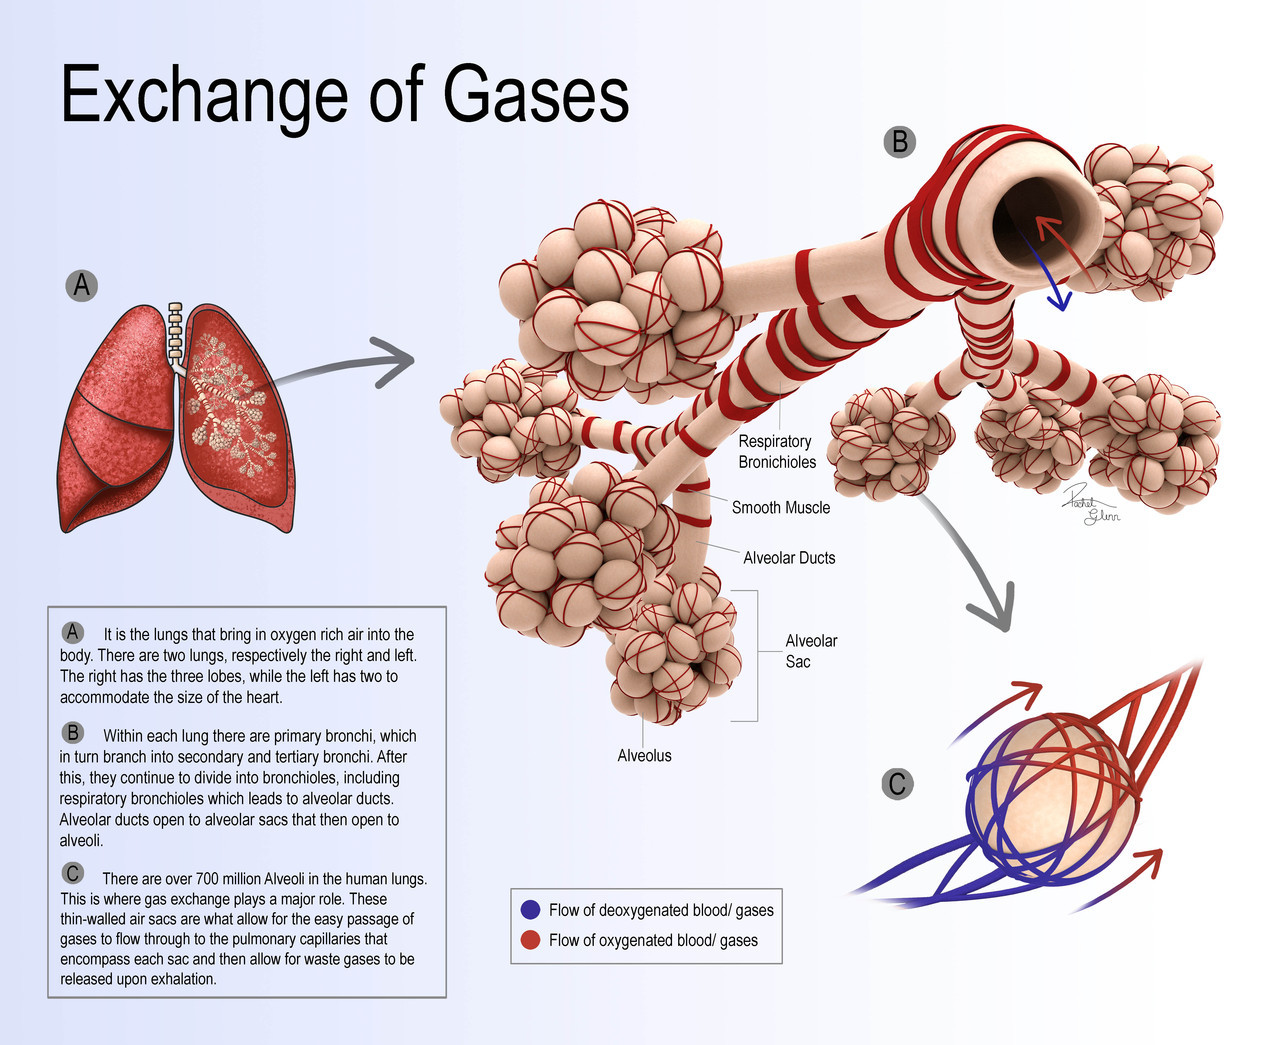 Exchange of Gases